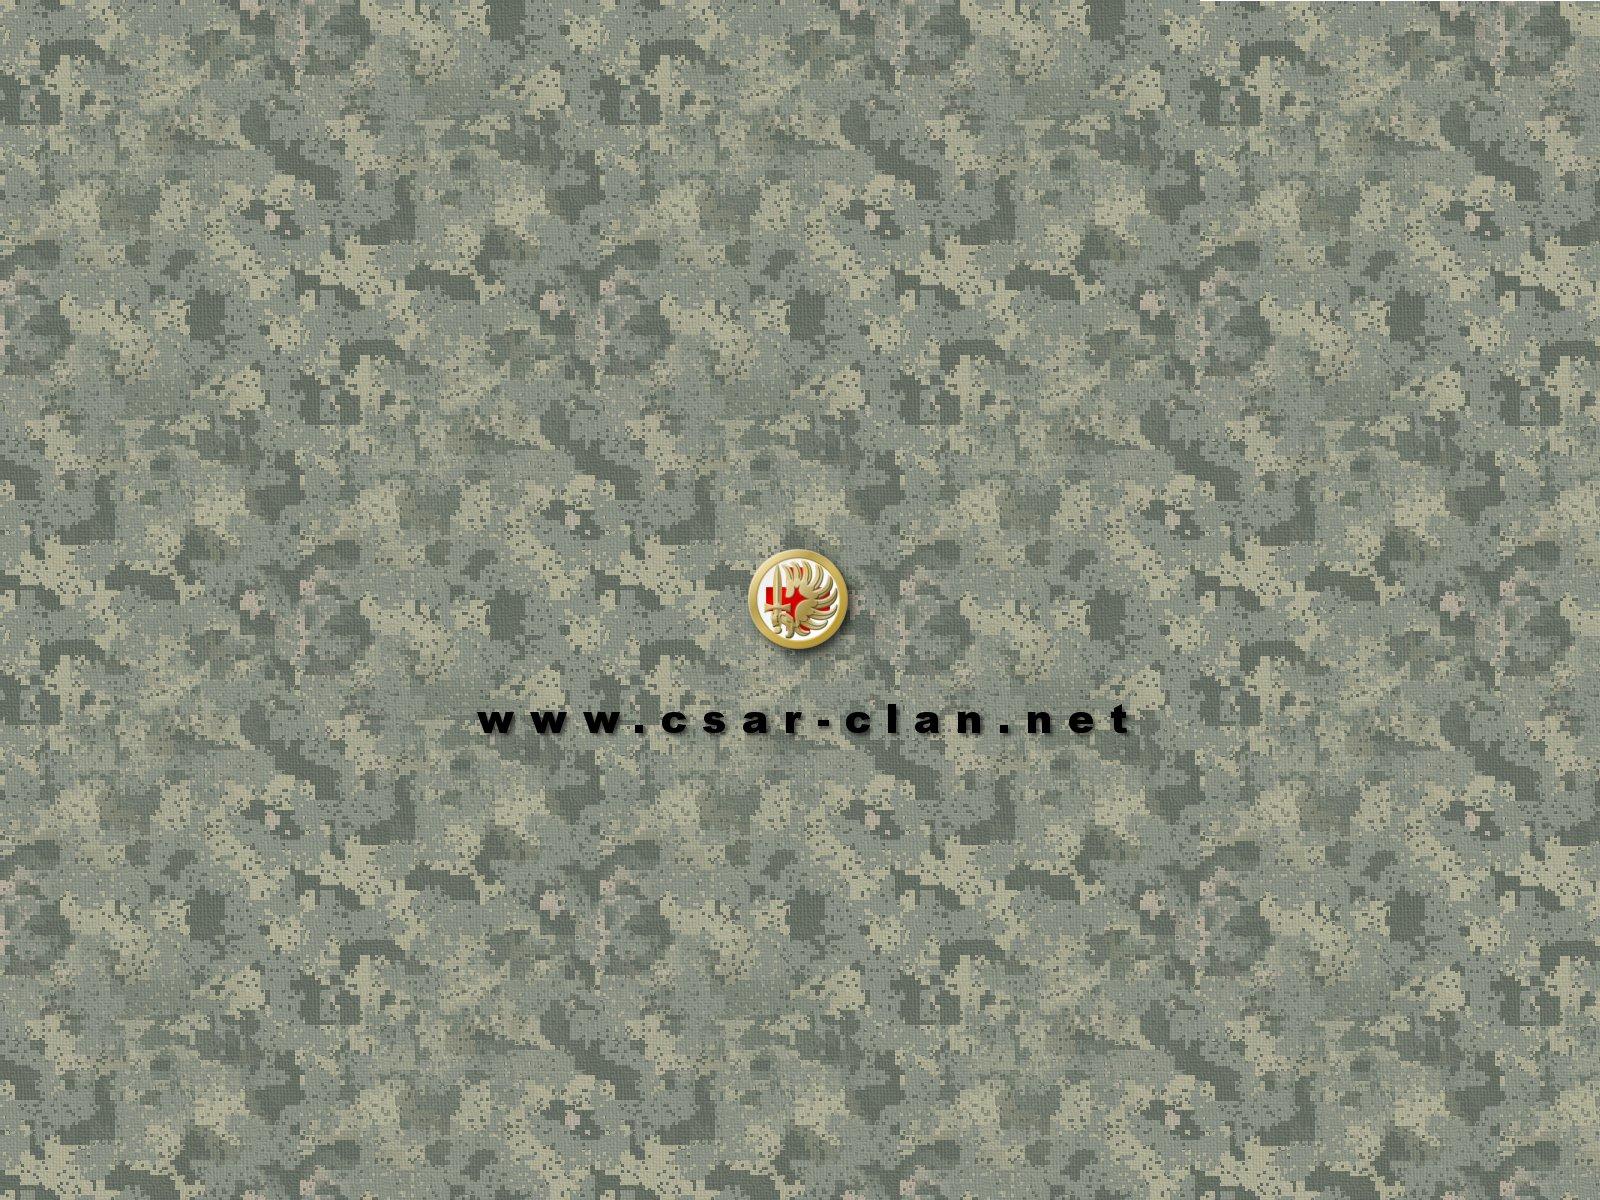 Digital Camouflage Wallpaper Hd Wallpapers